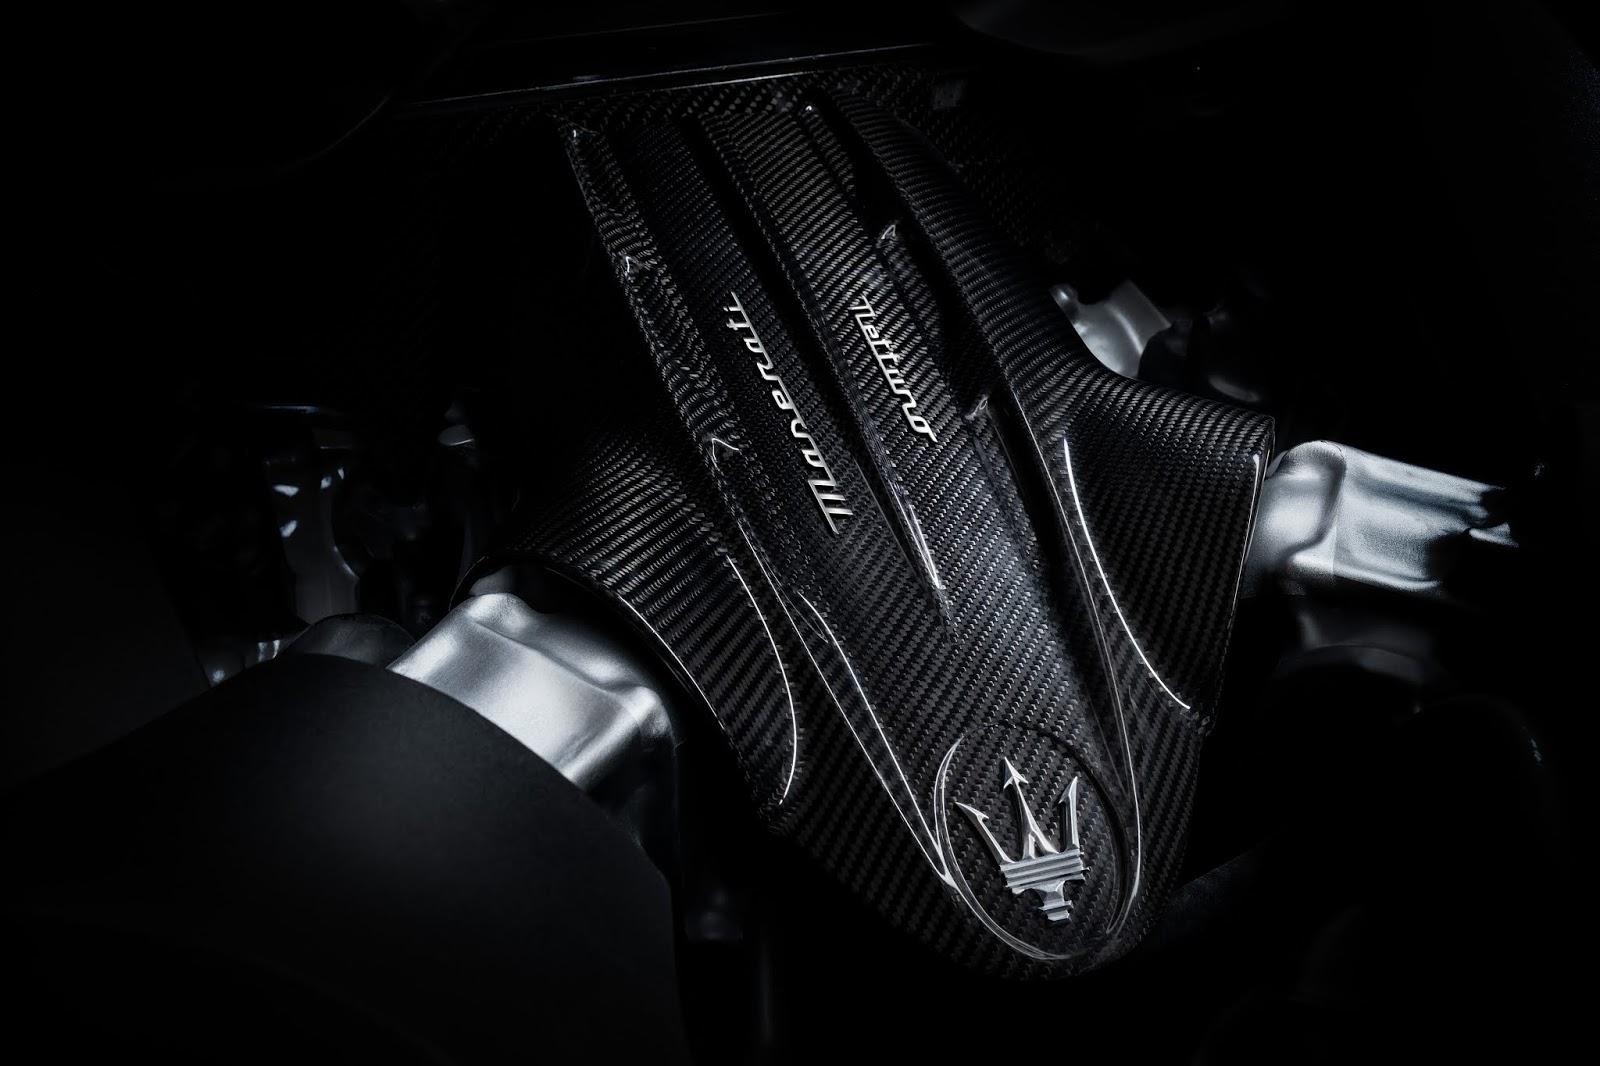 16832 MaseratiMC20 Η Maserati Zagato Mostro ακούγεται υπέροχα Car sound, Maserati, Maserati Zagato, Maserati Zagato Mostro, videos